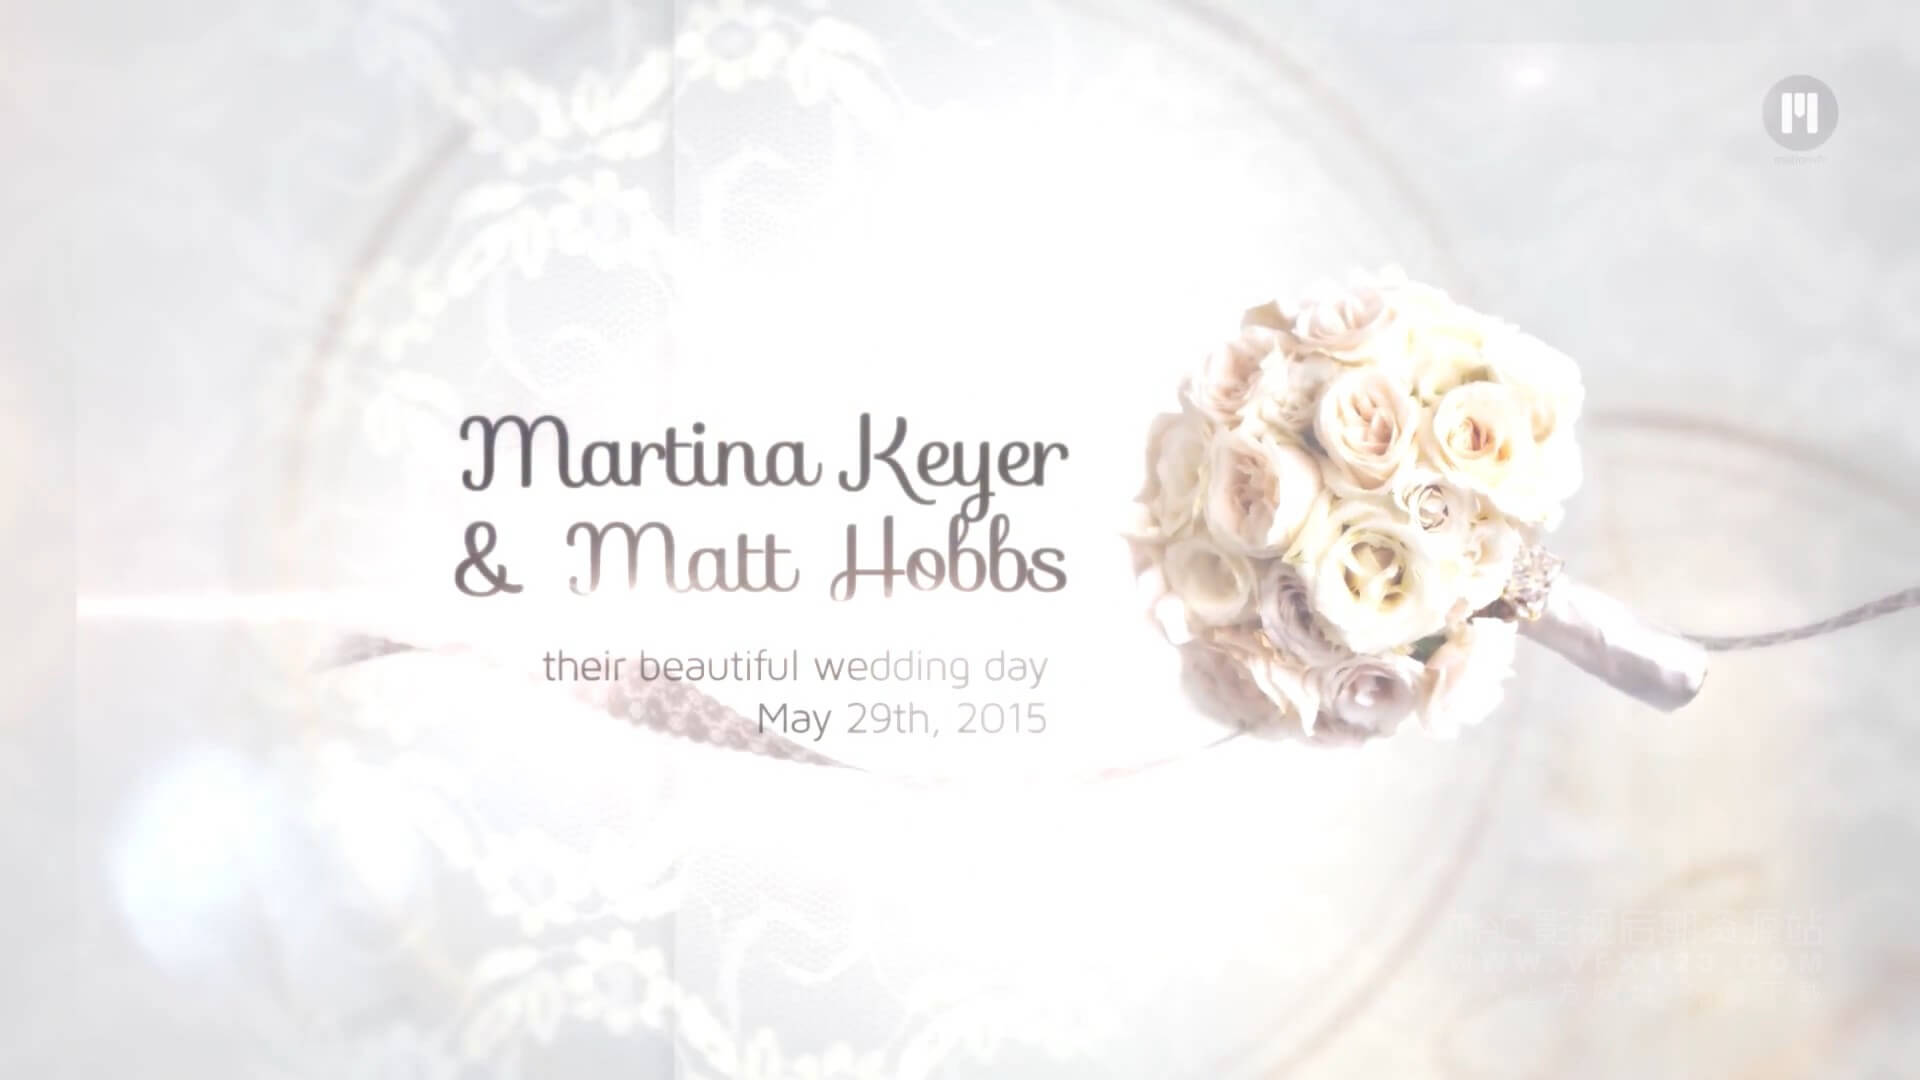 fcpx插件 20个浪漫婚礼标题文字动画模板 mTitle Wedding Pack | MAC影视后期资源站